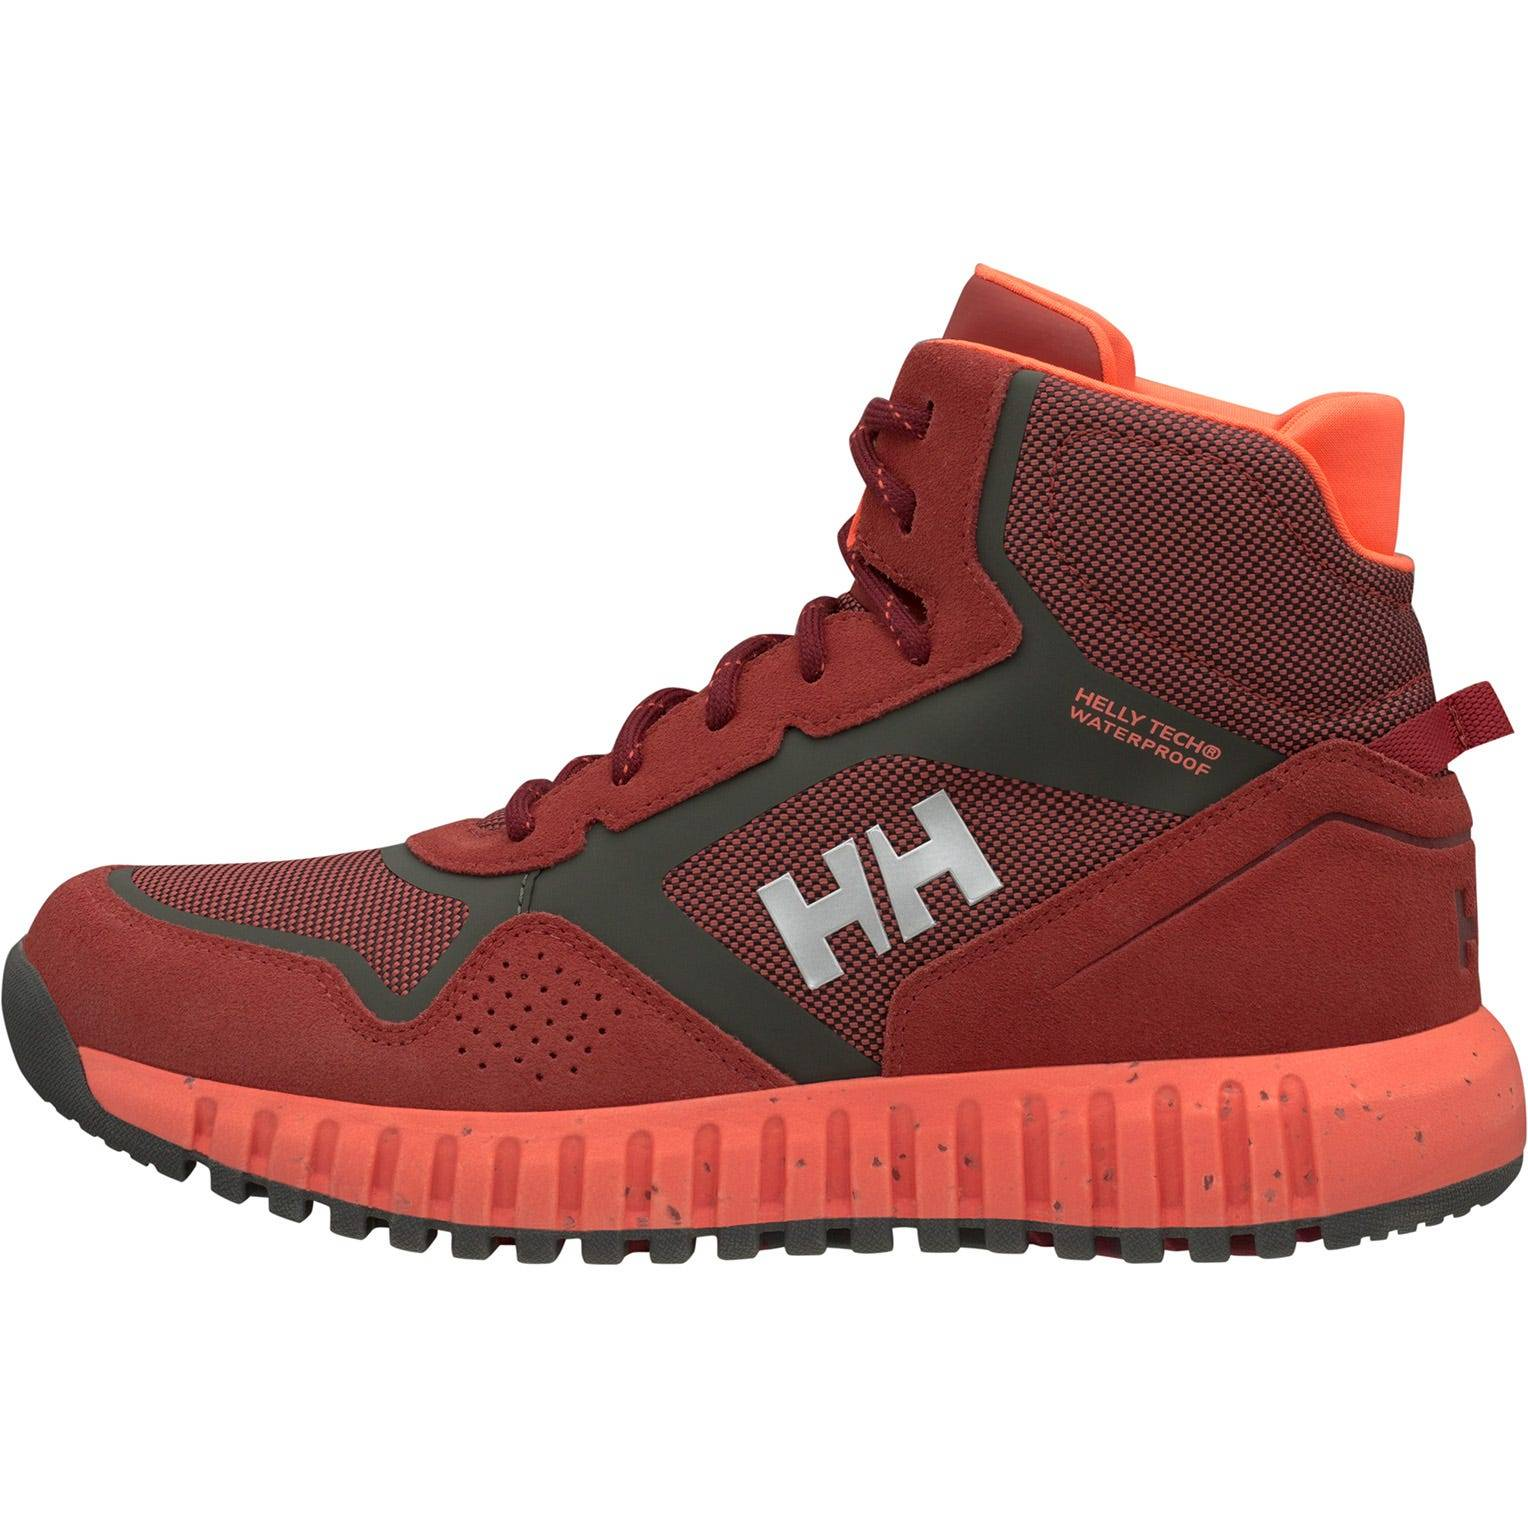 Helly Hansen W Monashee Ullr Ht Womens Hiking Boot Red 38/7